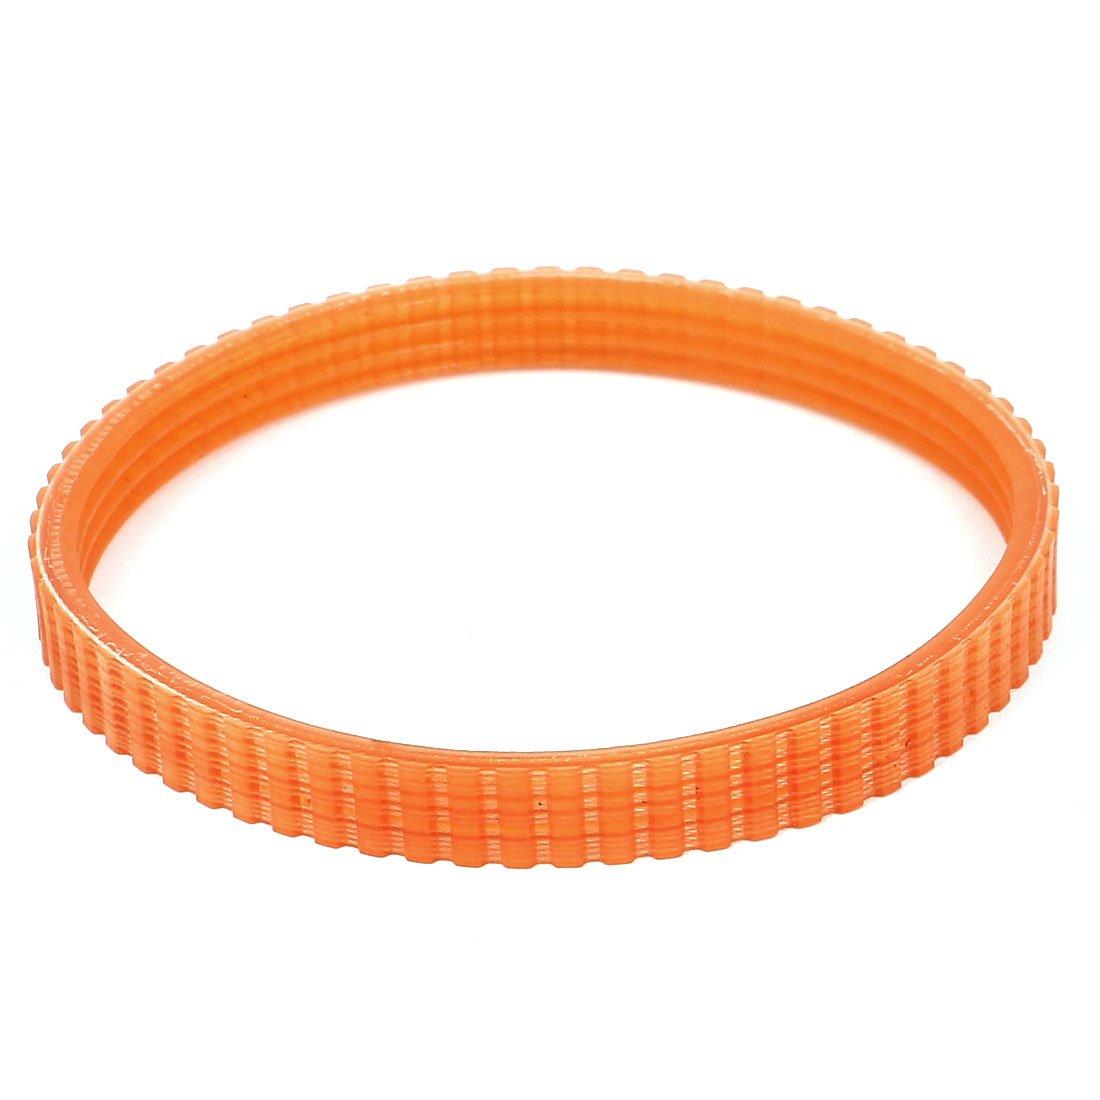 PU-Leder Sourcingmap/® Antriebsriemen f/ür Makita 1911B 268 mm Gurt Orange